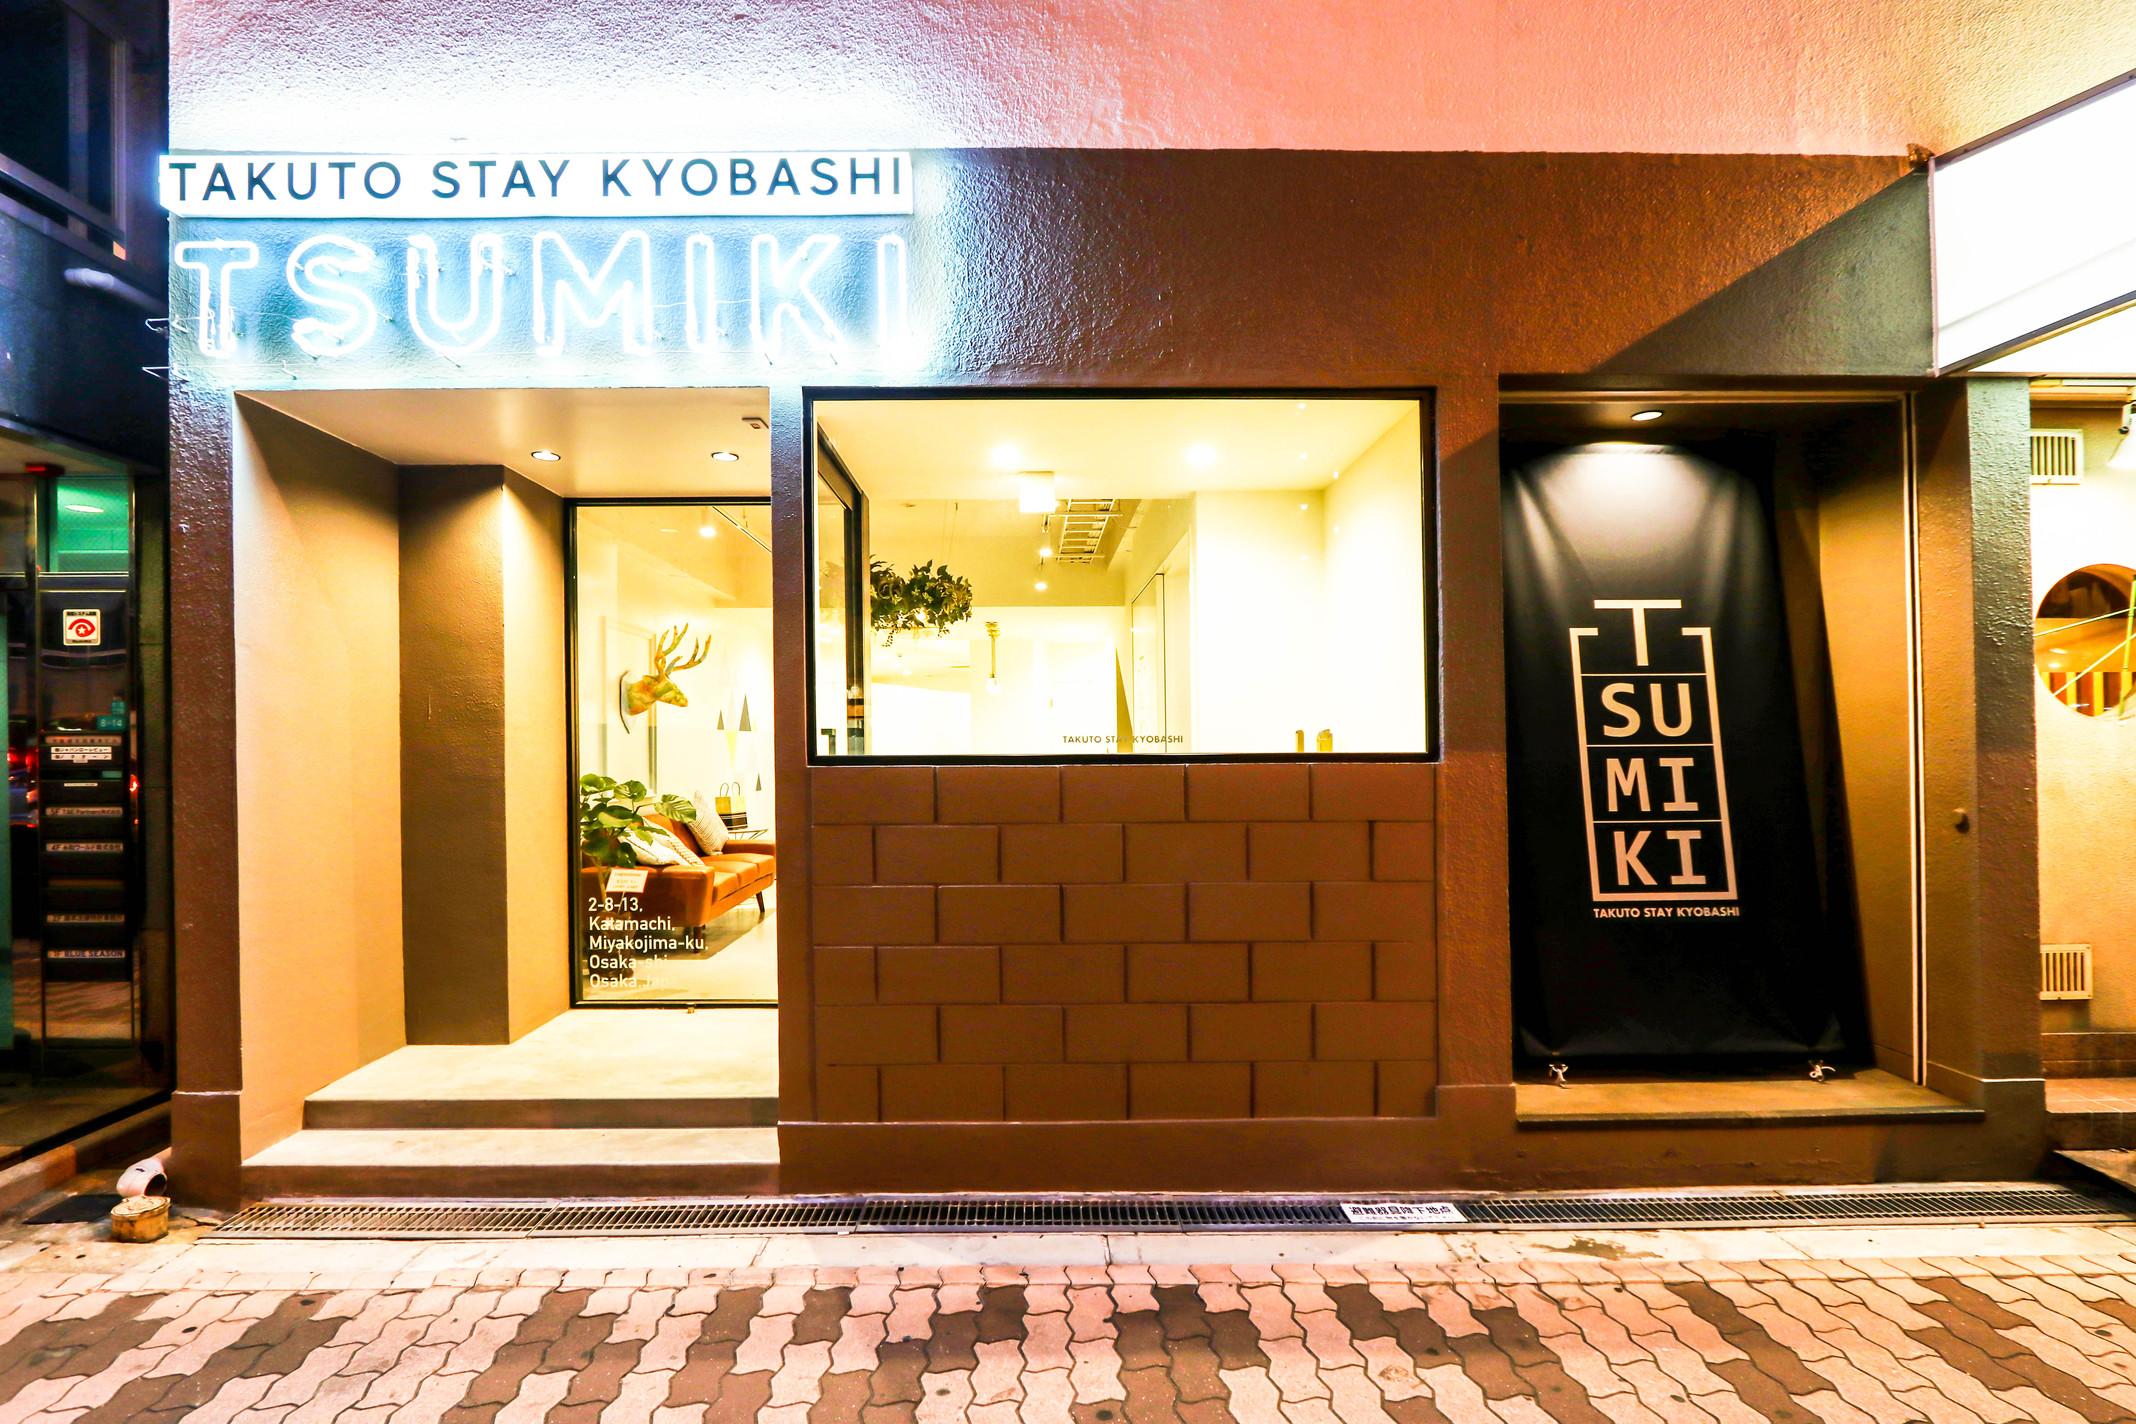 TAKUTO STAY 京橋 TSUMIKI image